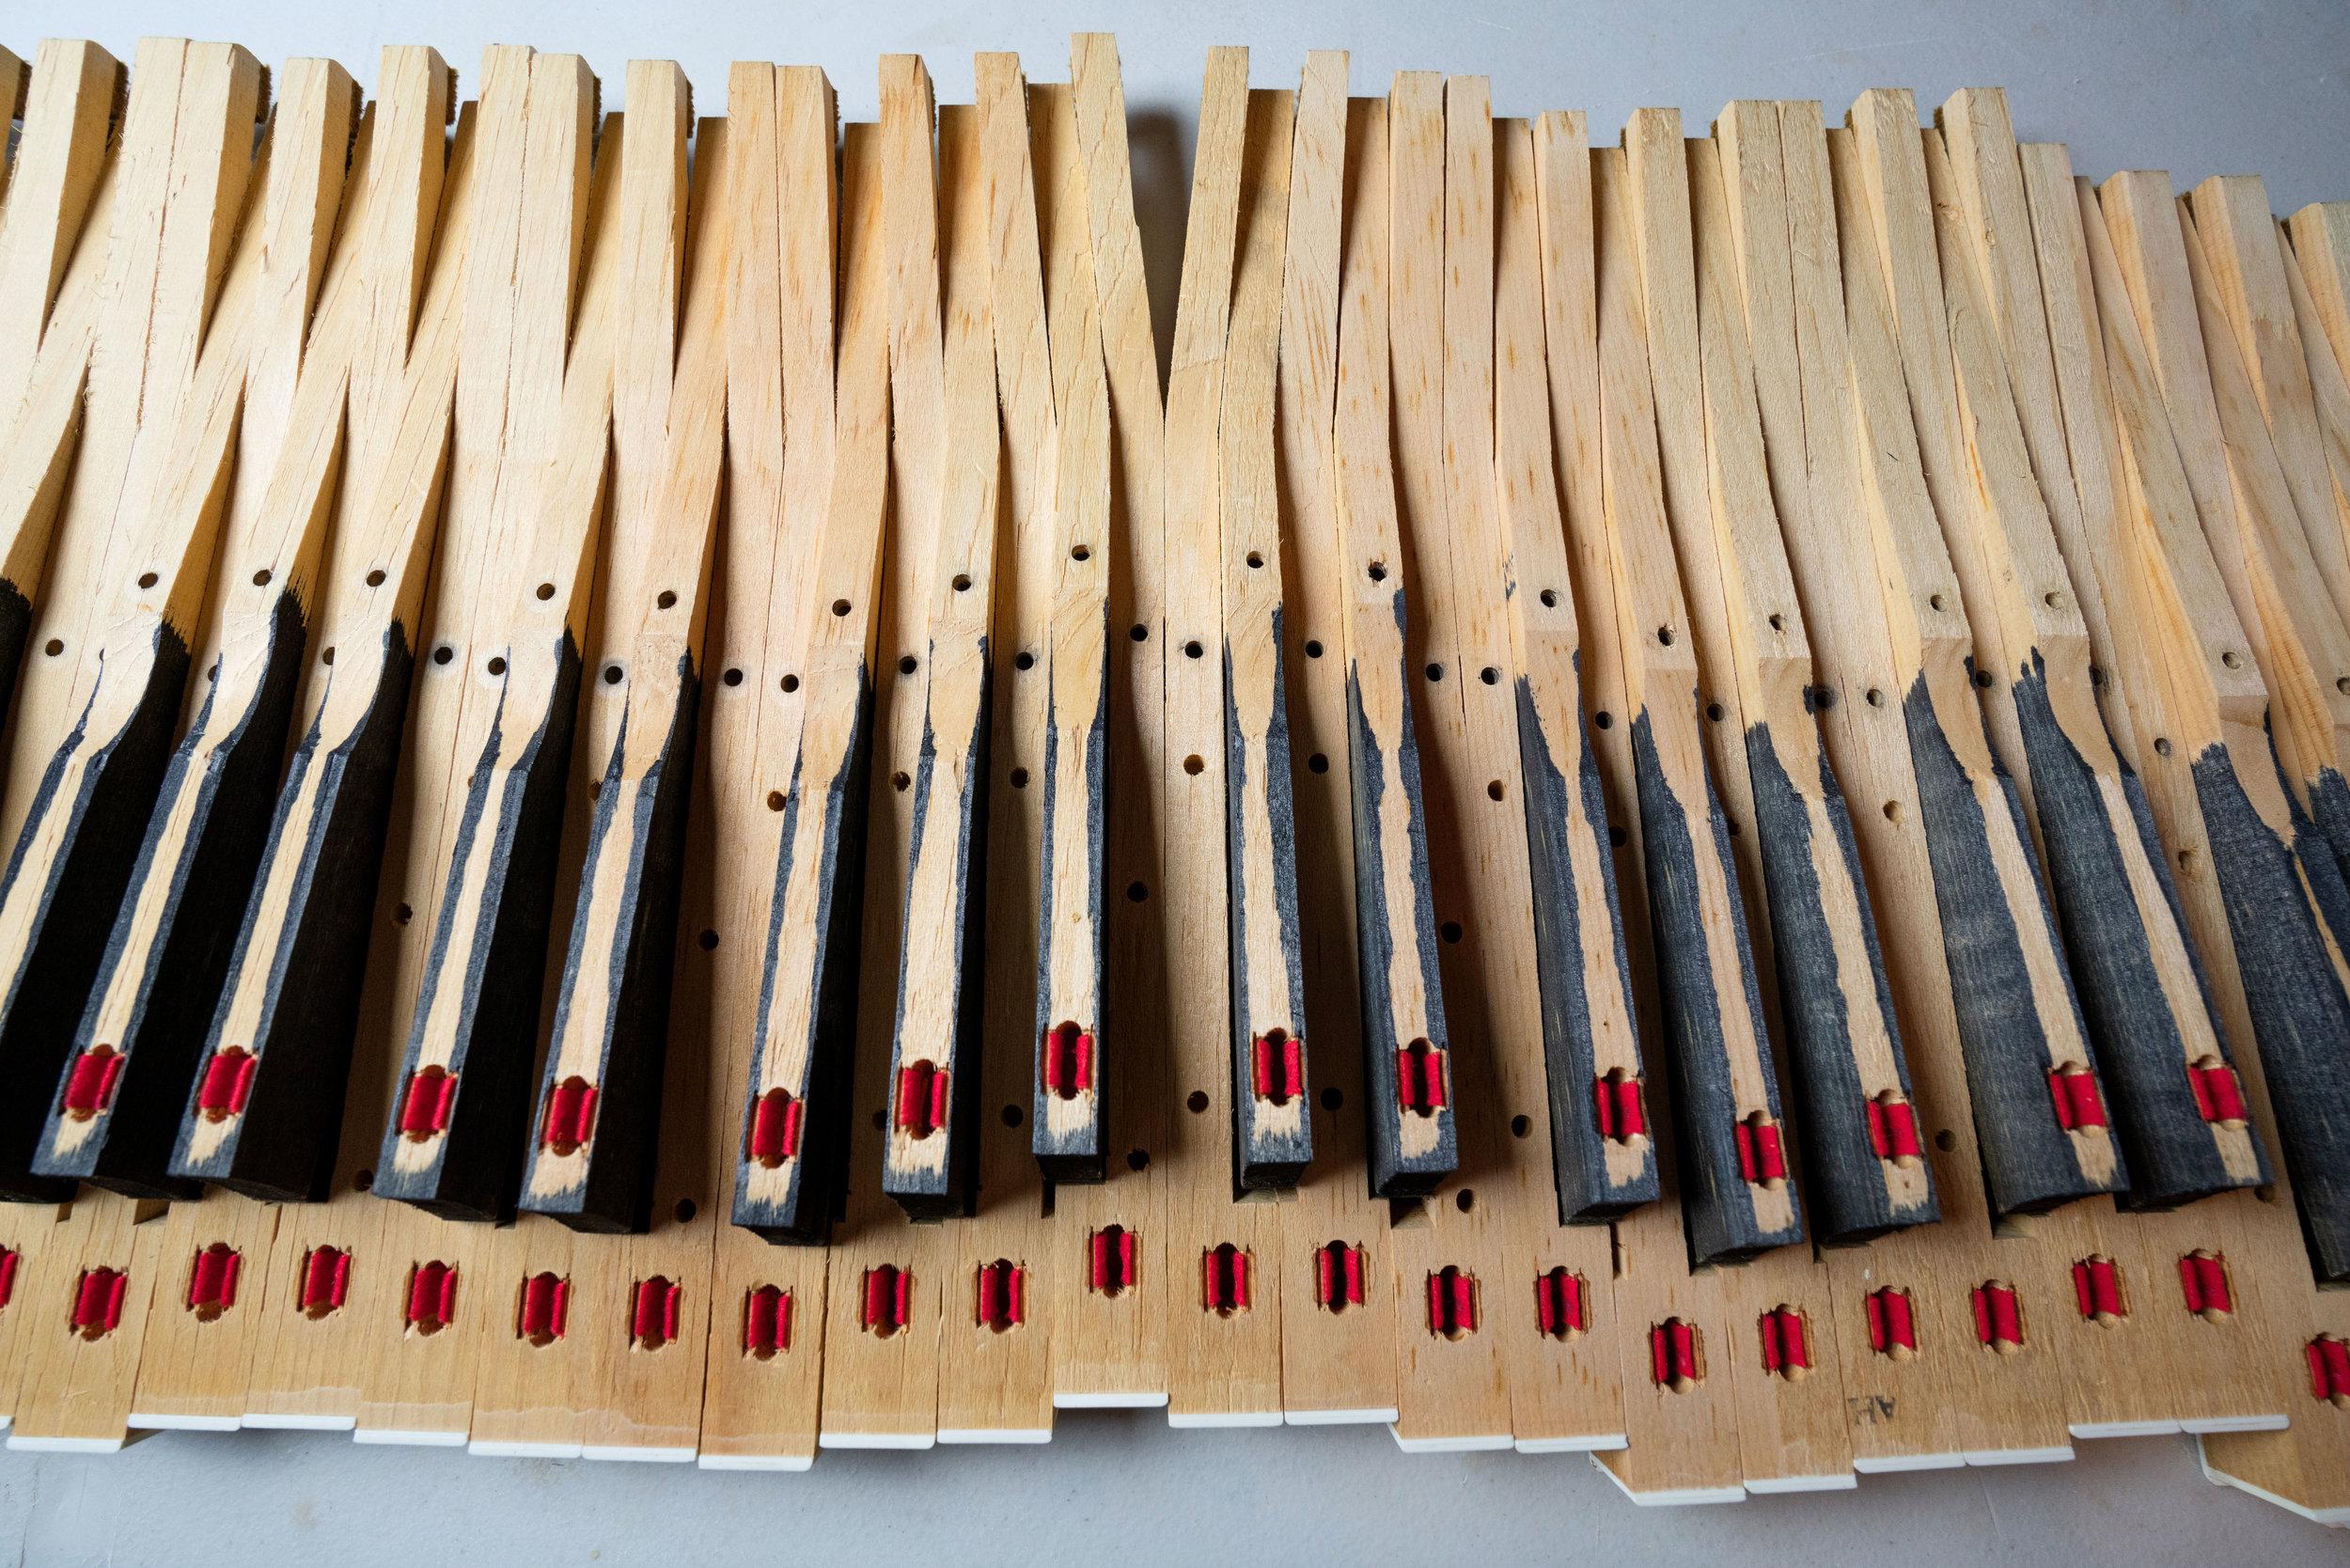 wurlitzer-200-key-bushing-felts.jpg